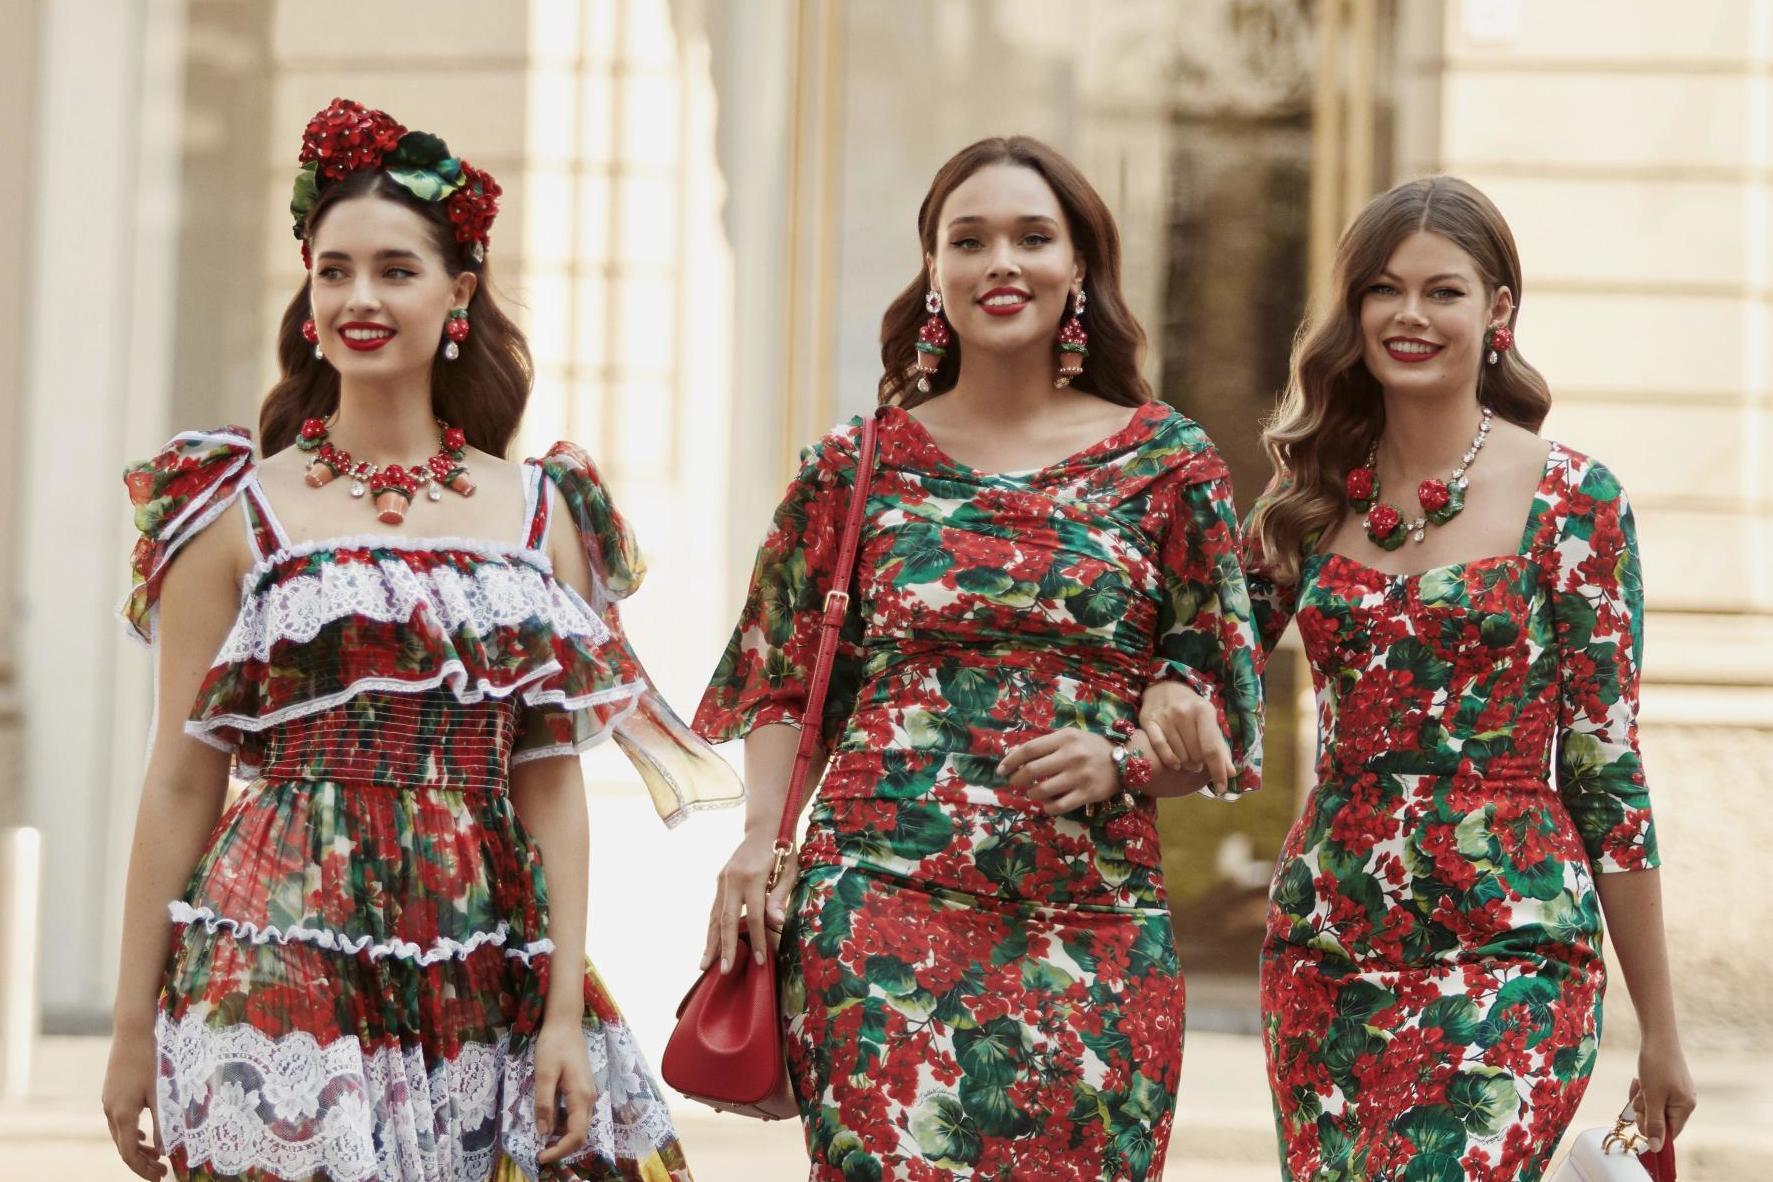 Dolce & Gabbana incluye a modelos de talla grande